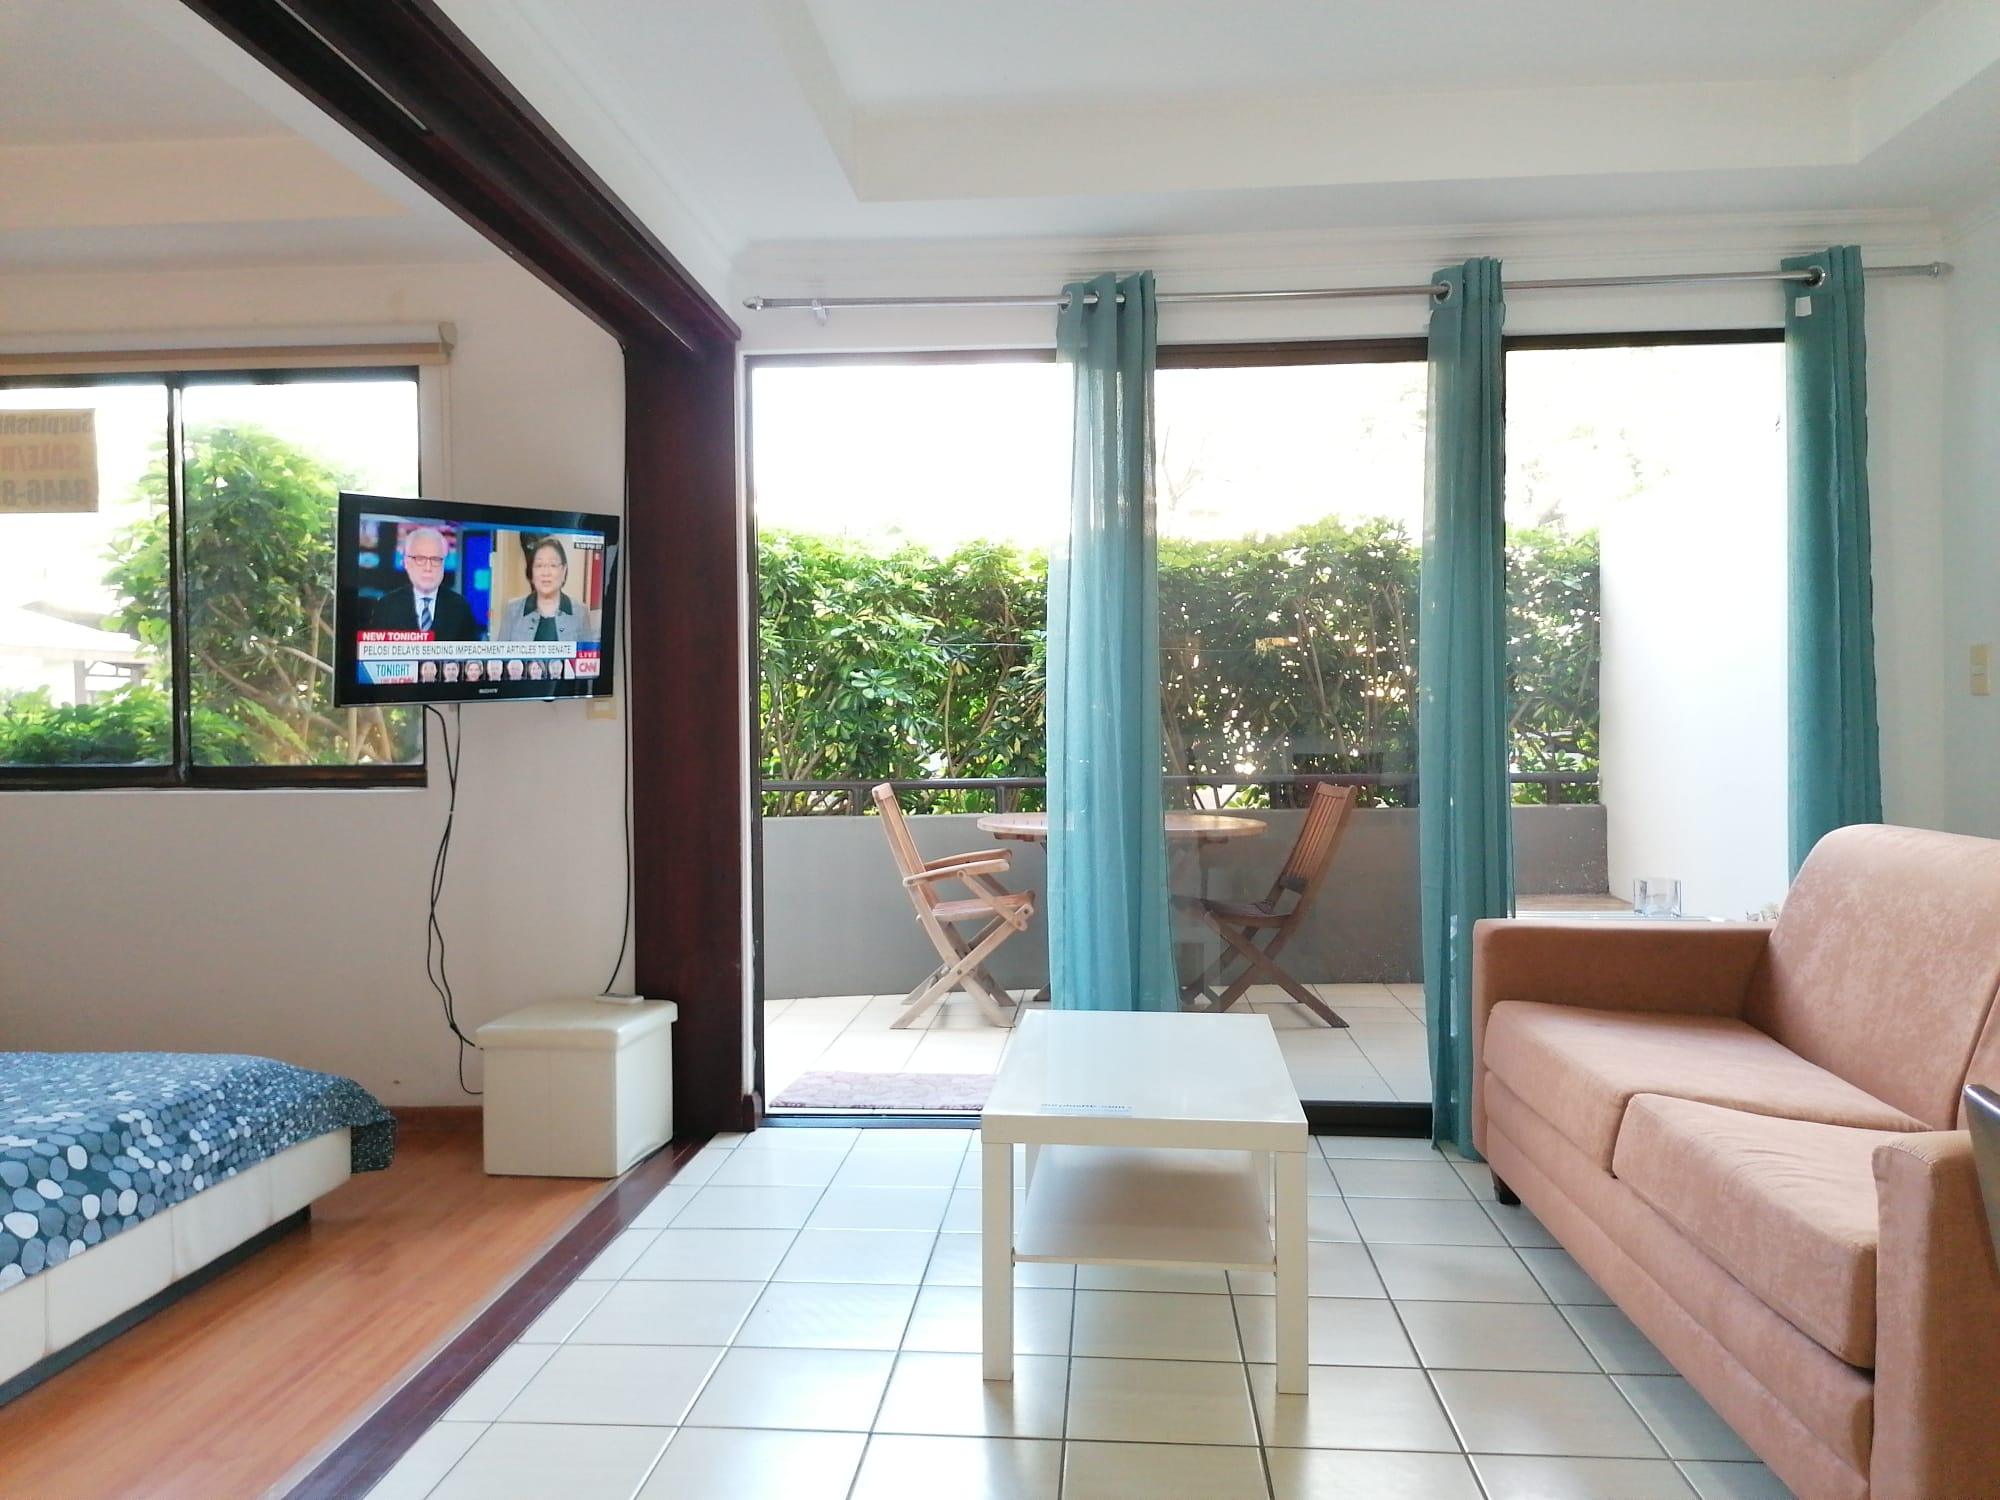 1 Bedroom Condo With Terrace Avalon Santa Ana Condominiums For Rent In Santa Ana San Jose Costa Rica